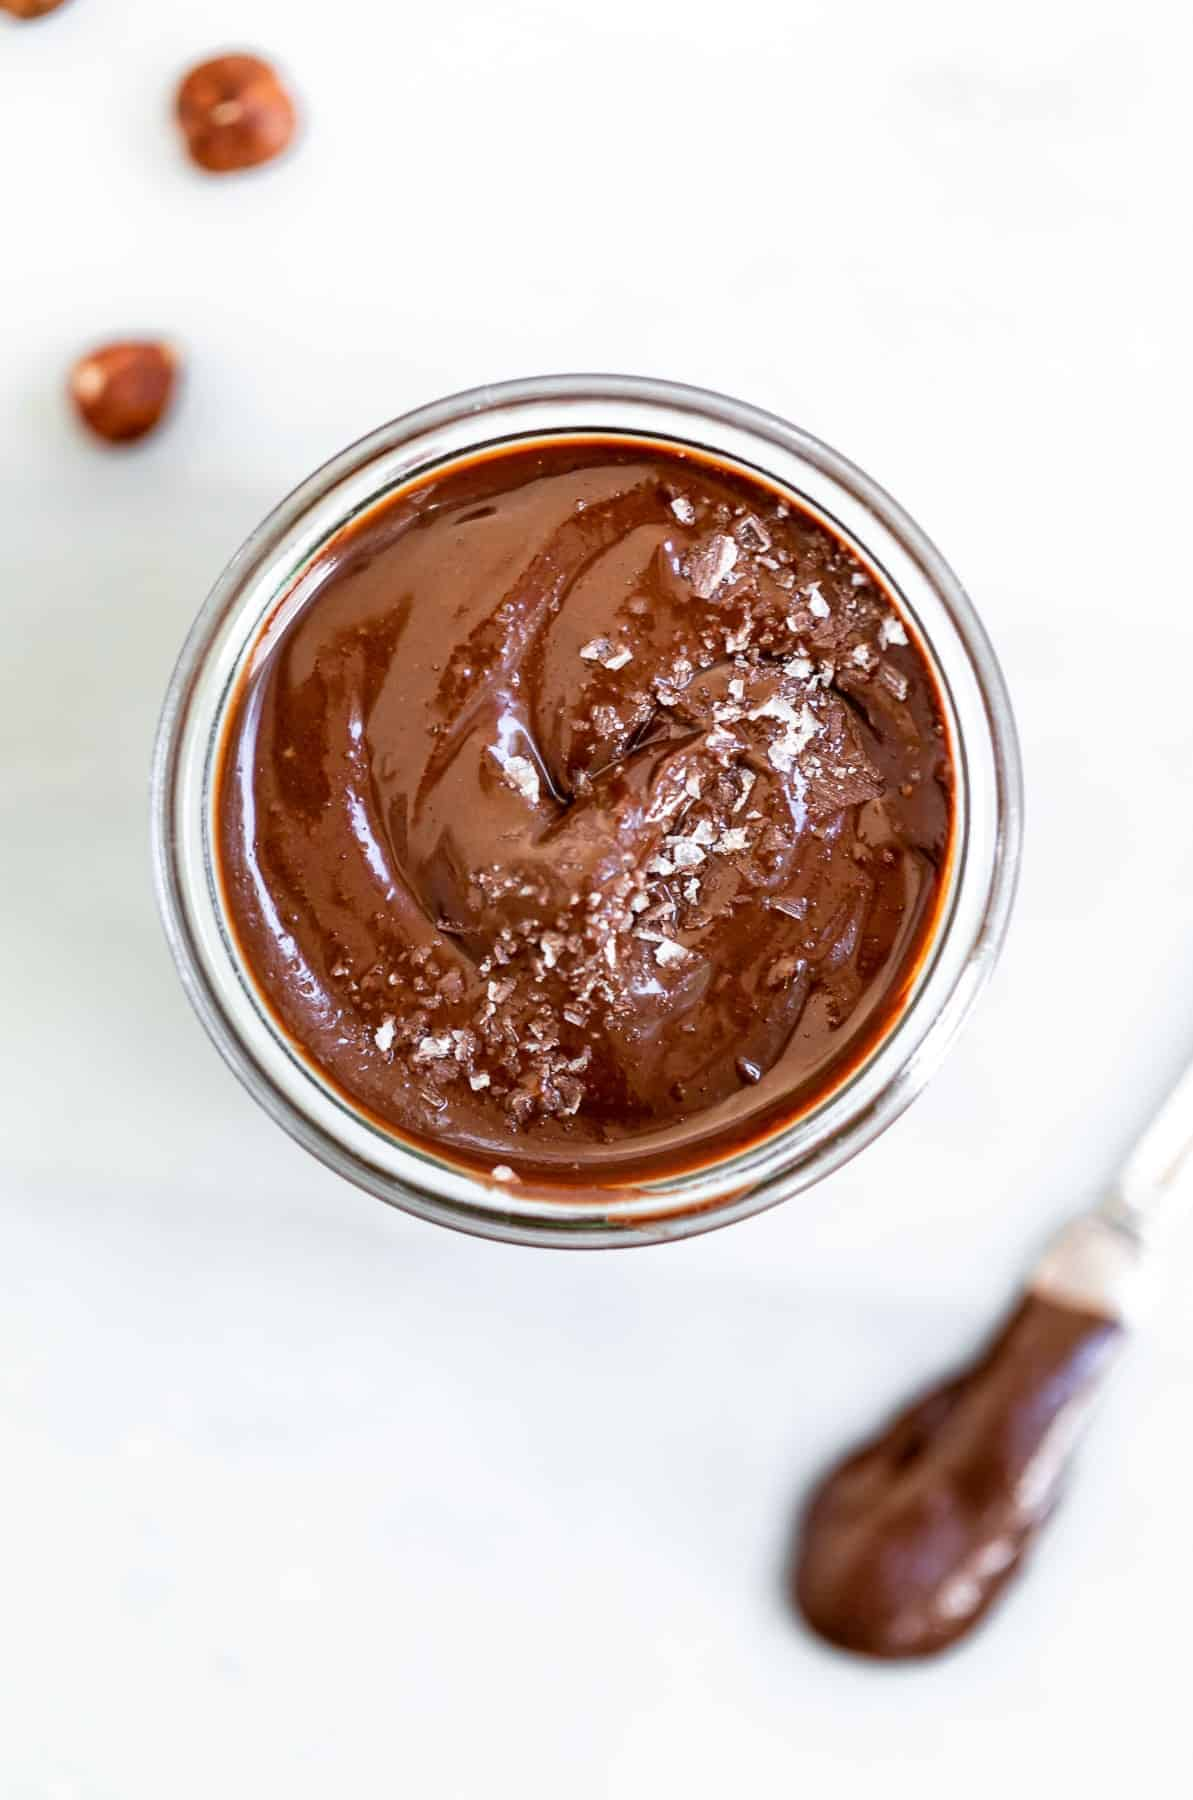 Vegan nutella in a jar with sea salt on top.